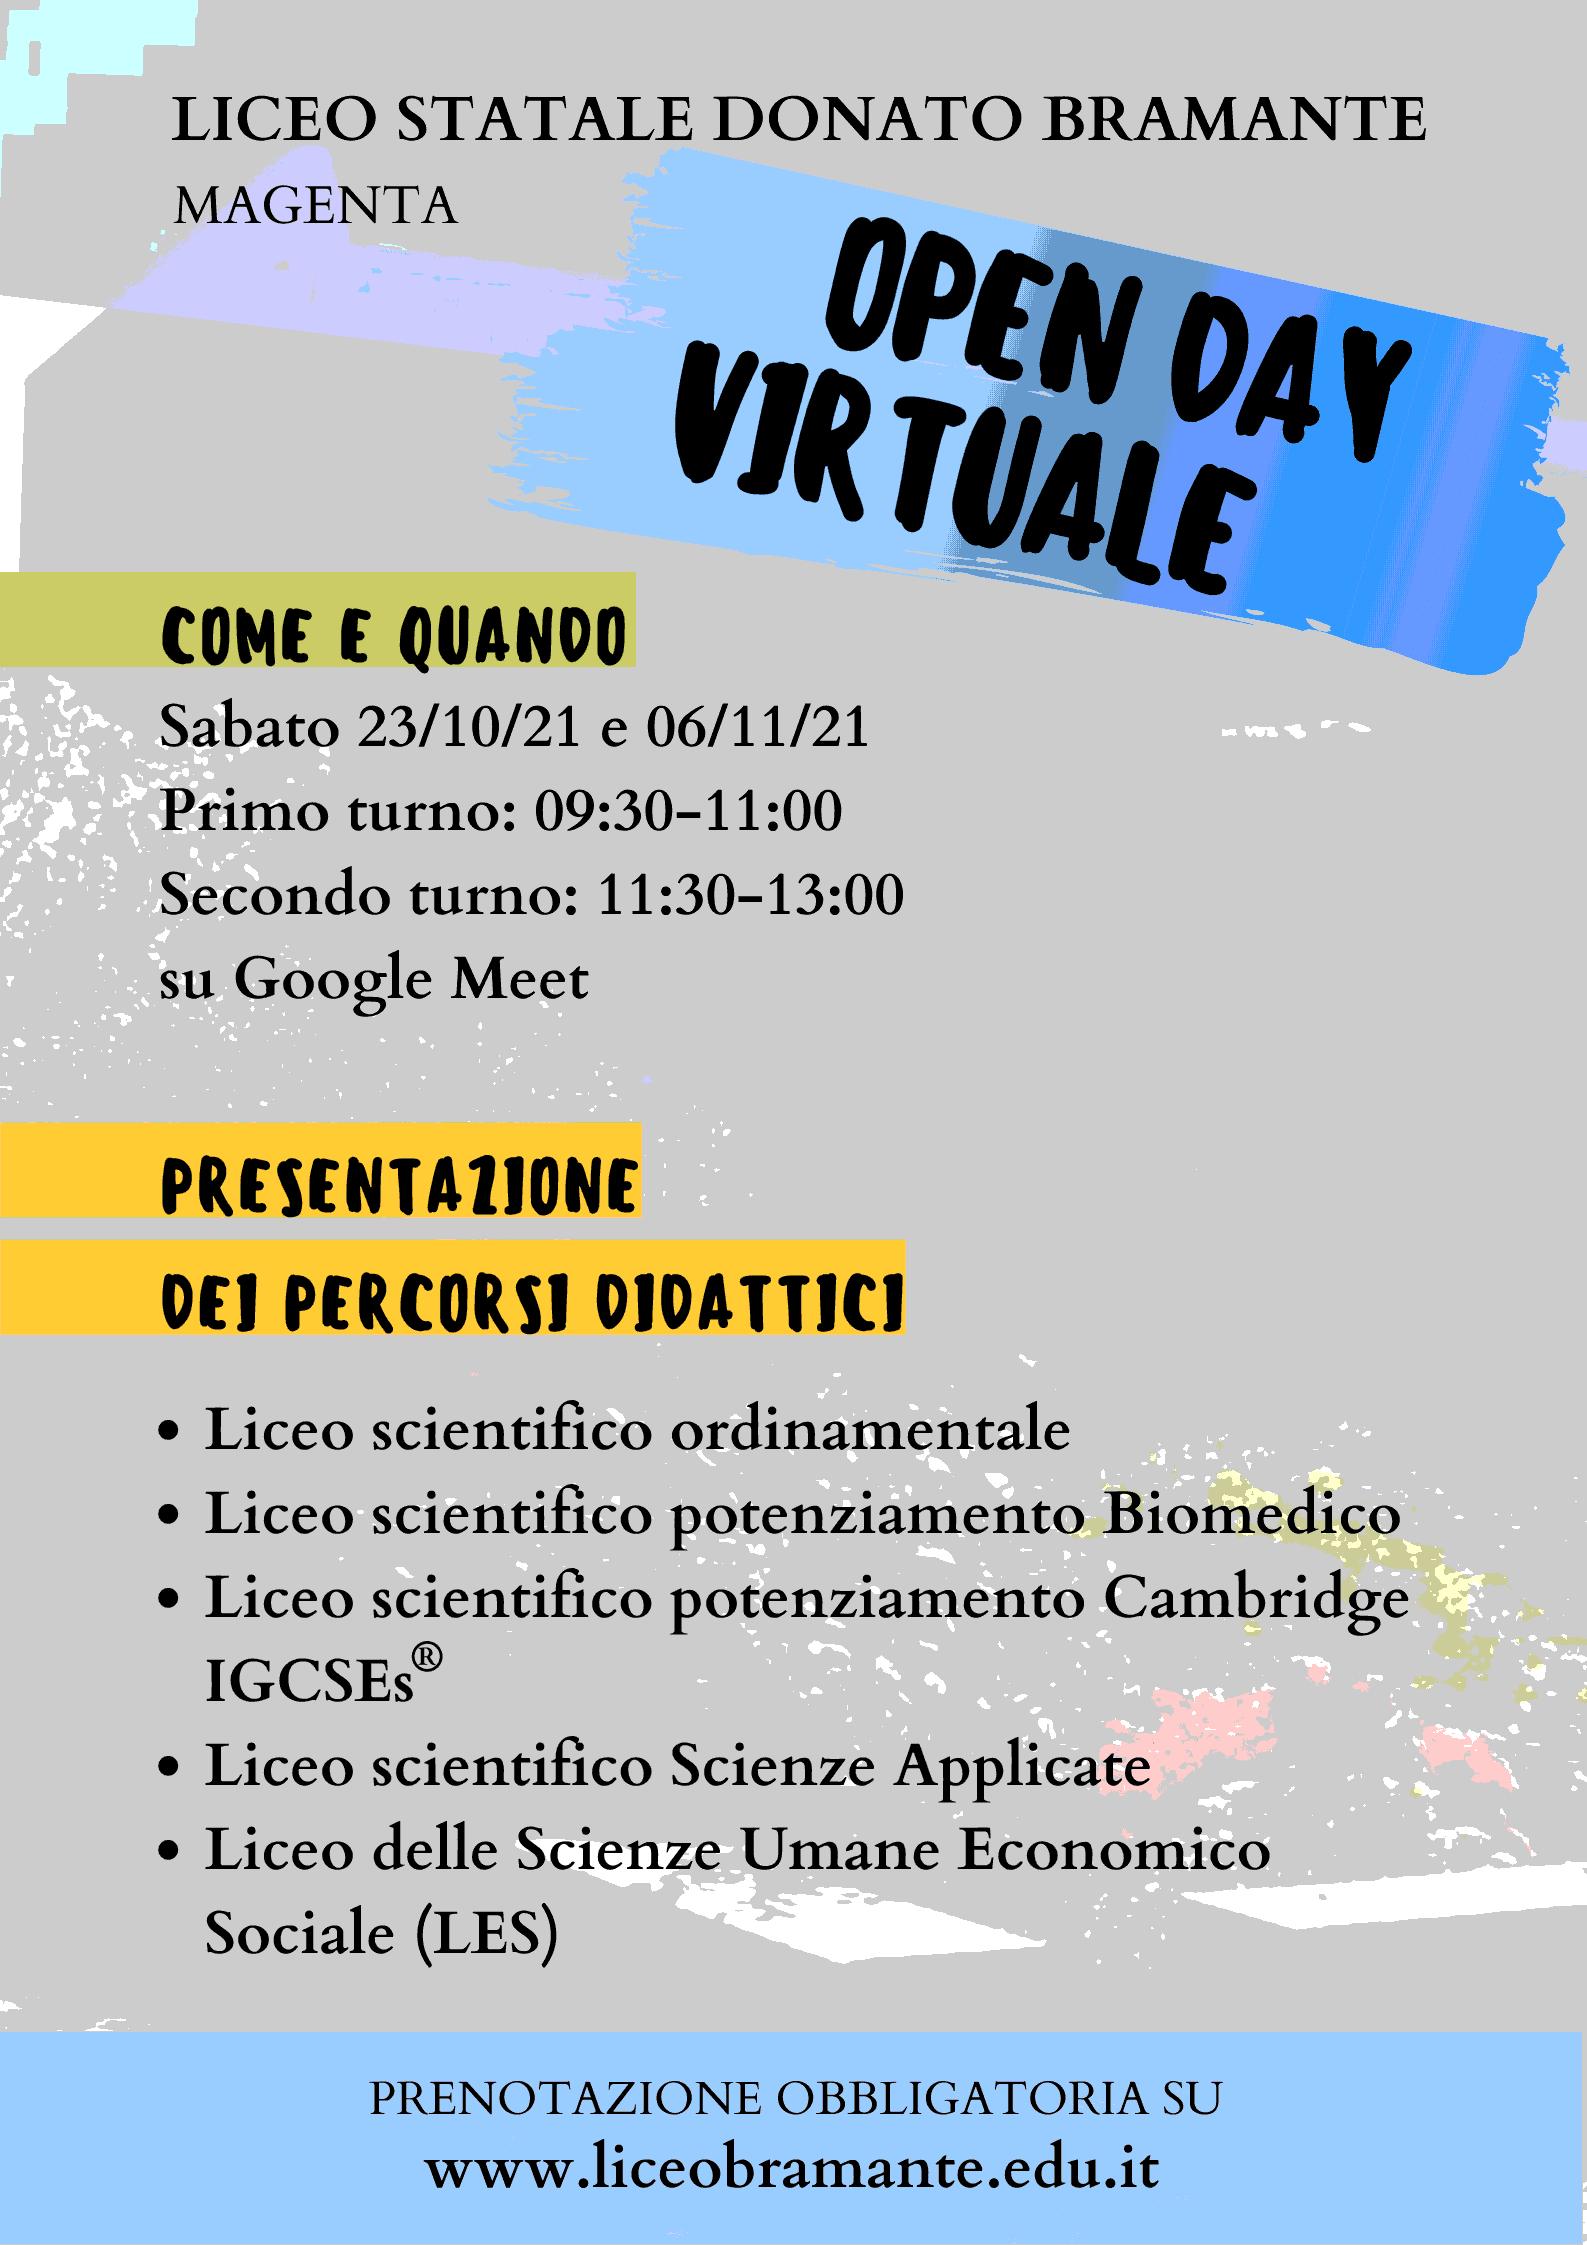 Locandina Open Day virtuale